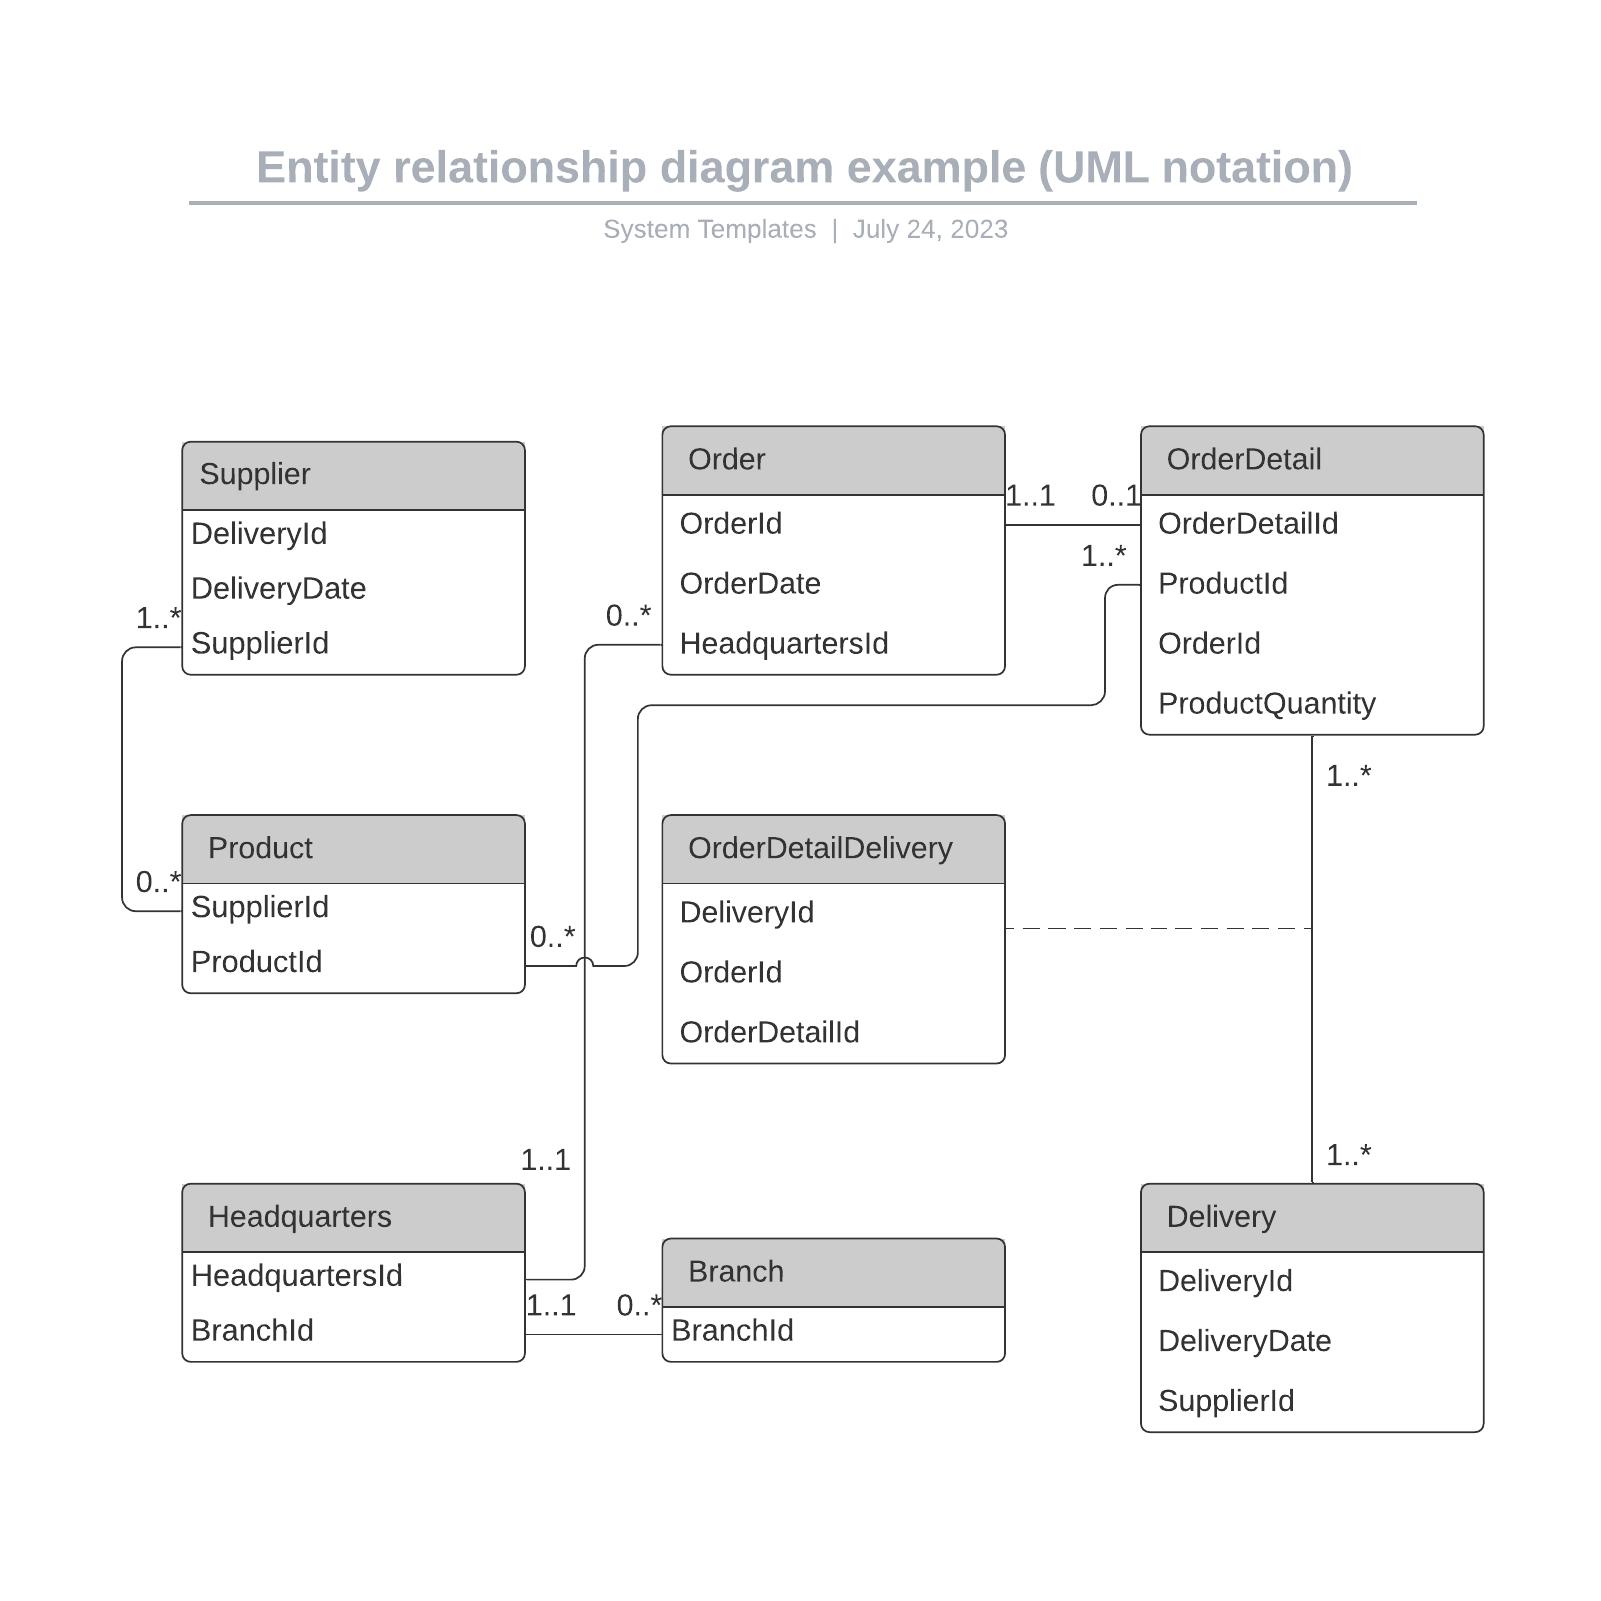 Entity relationship diagram example (UML notation)